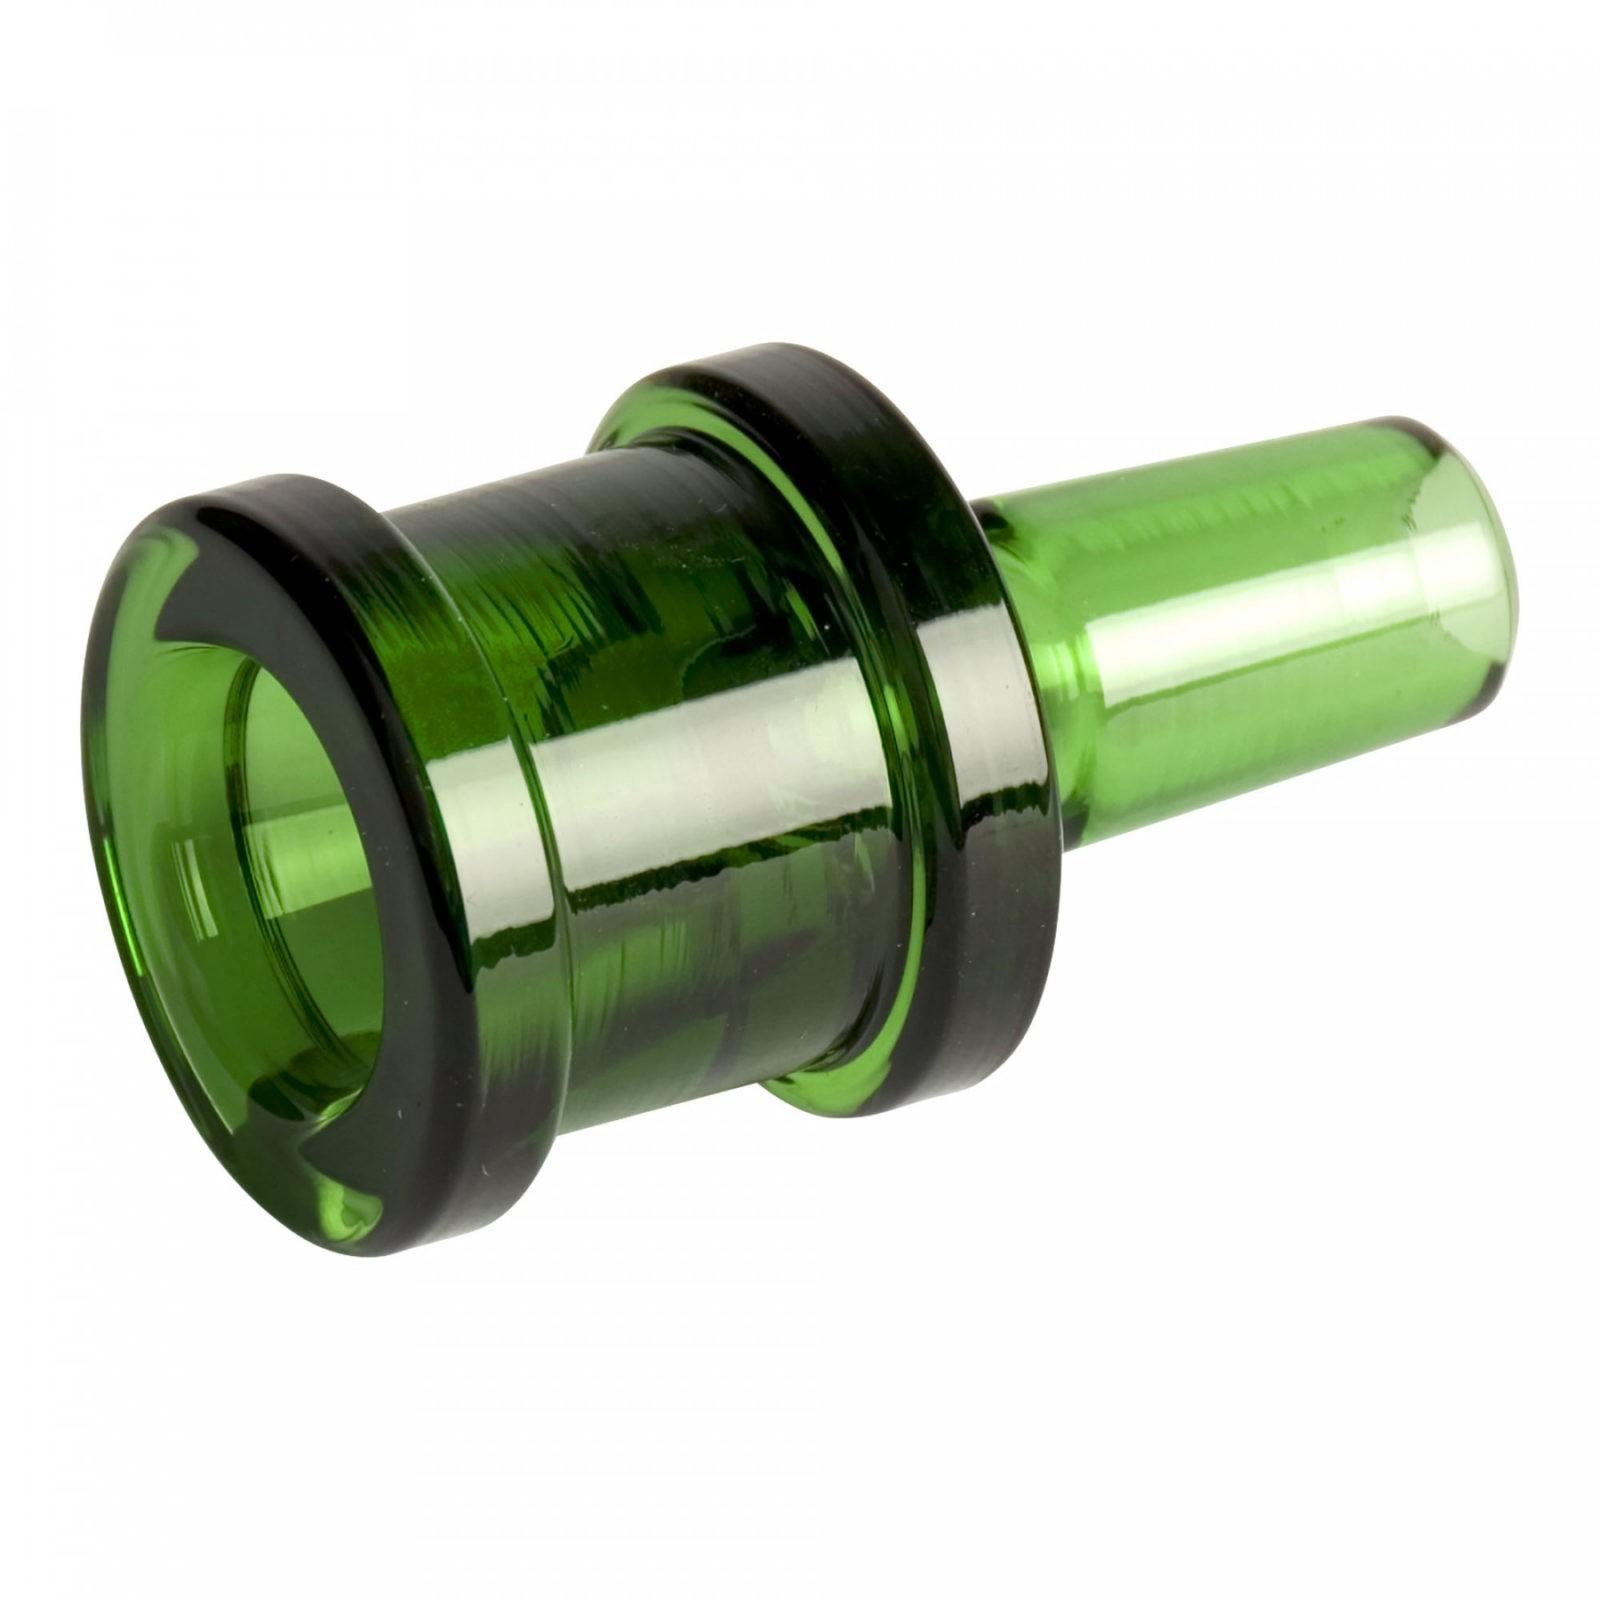 Gear Premium® 14Mm Xl Sugar Barrel Pull-Out G1241 &Bull; 2021